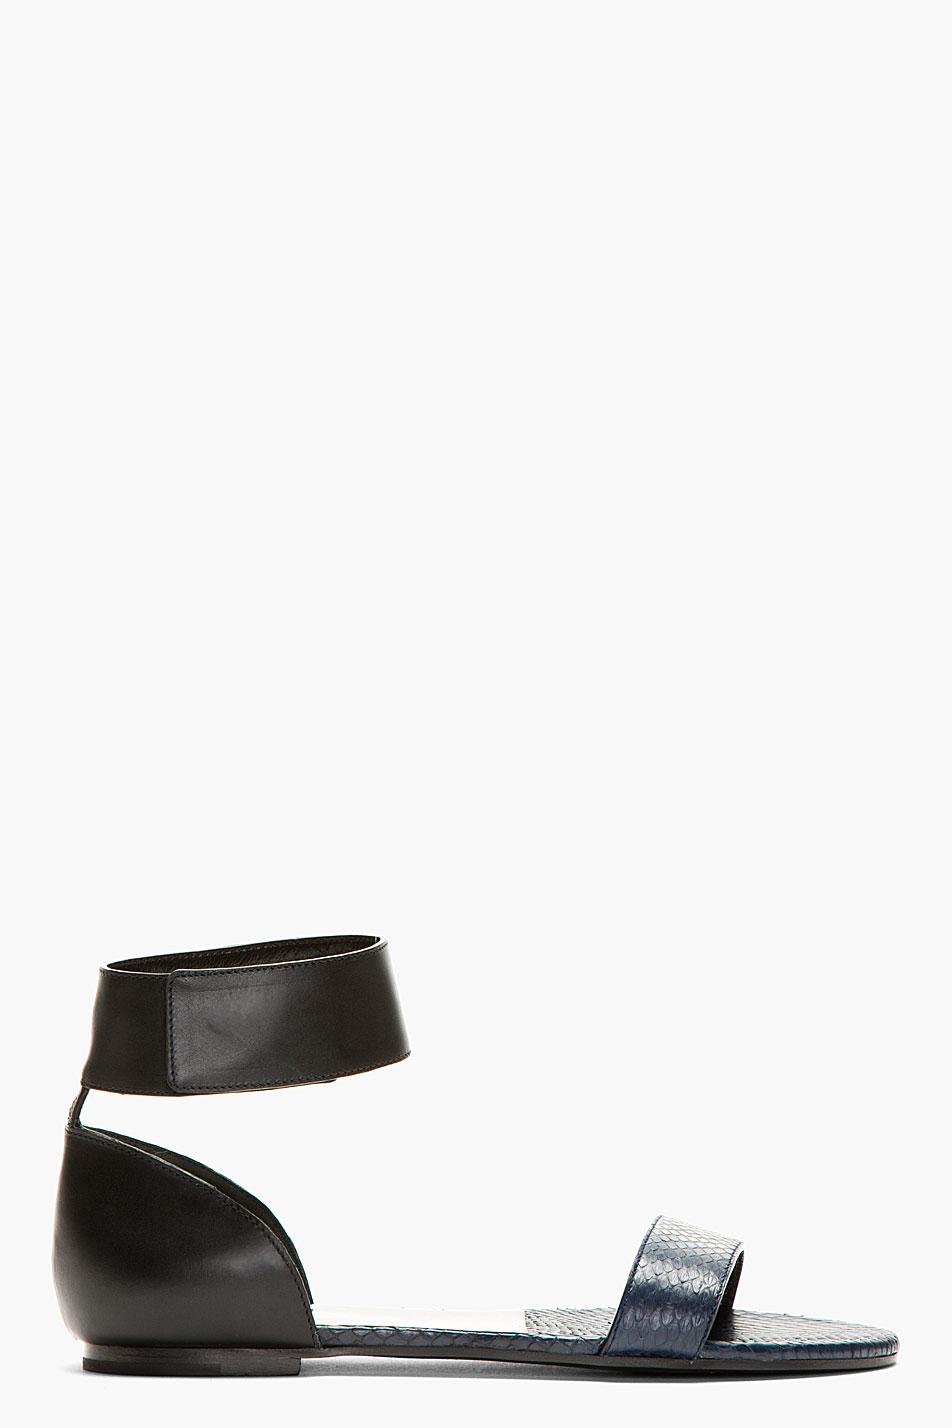 Chlo black and blue snakeskin flat sandals